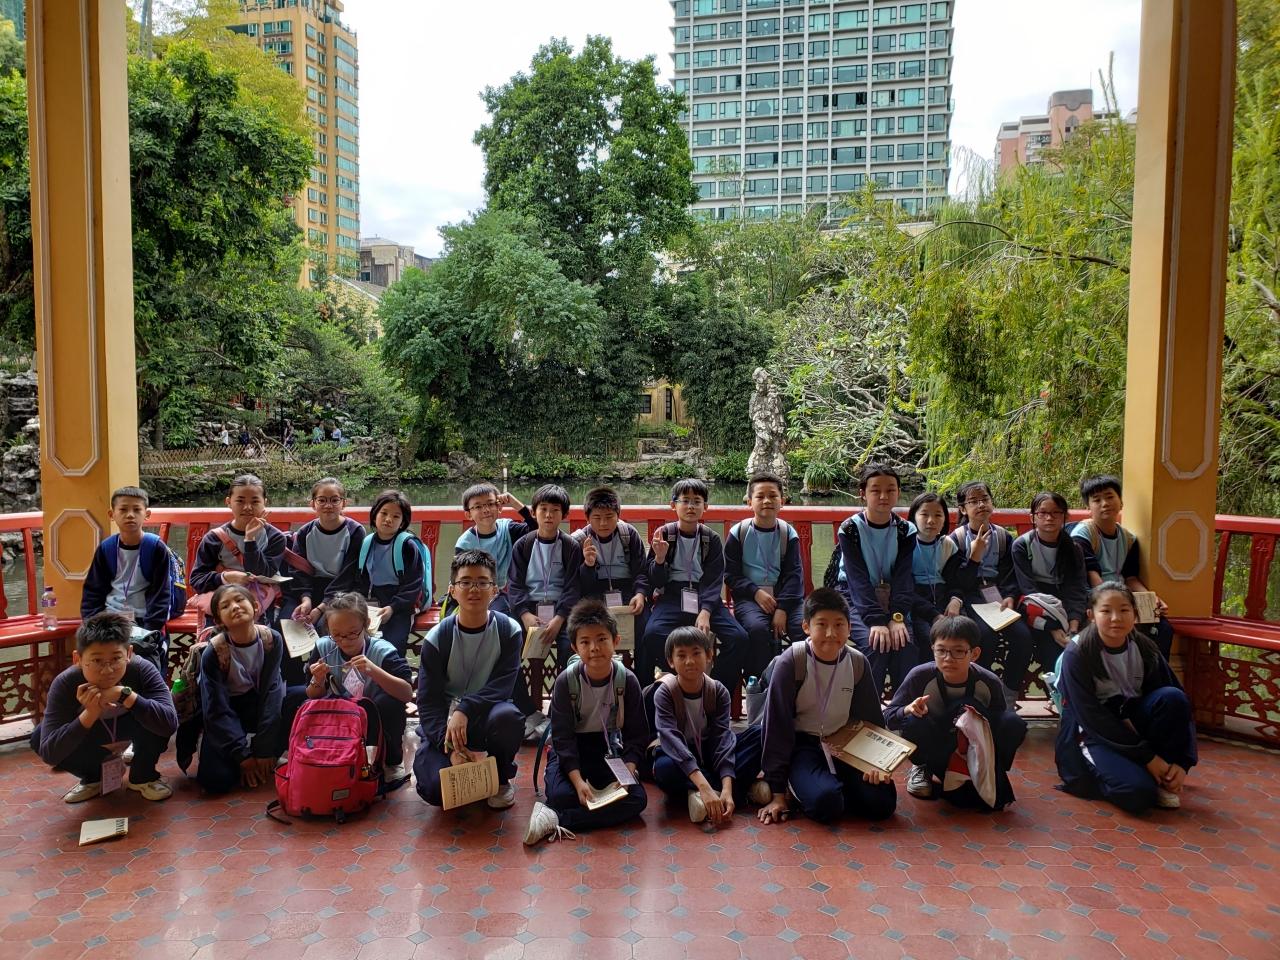 http://keito.school.hk/sites/default/files/batch_20191217_121213.jpg